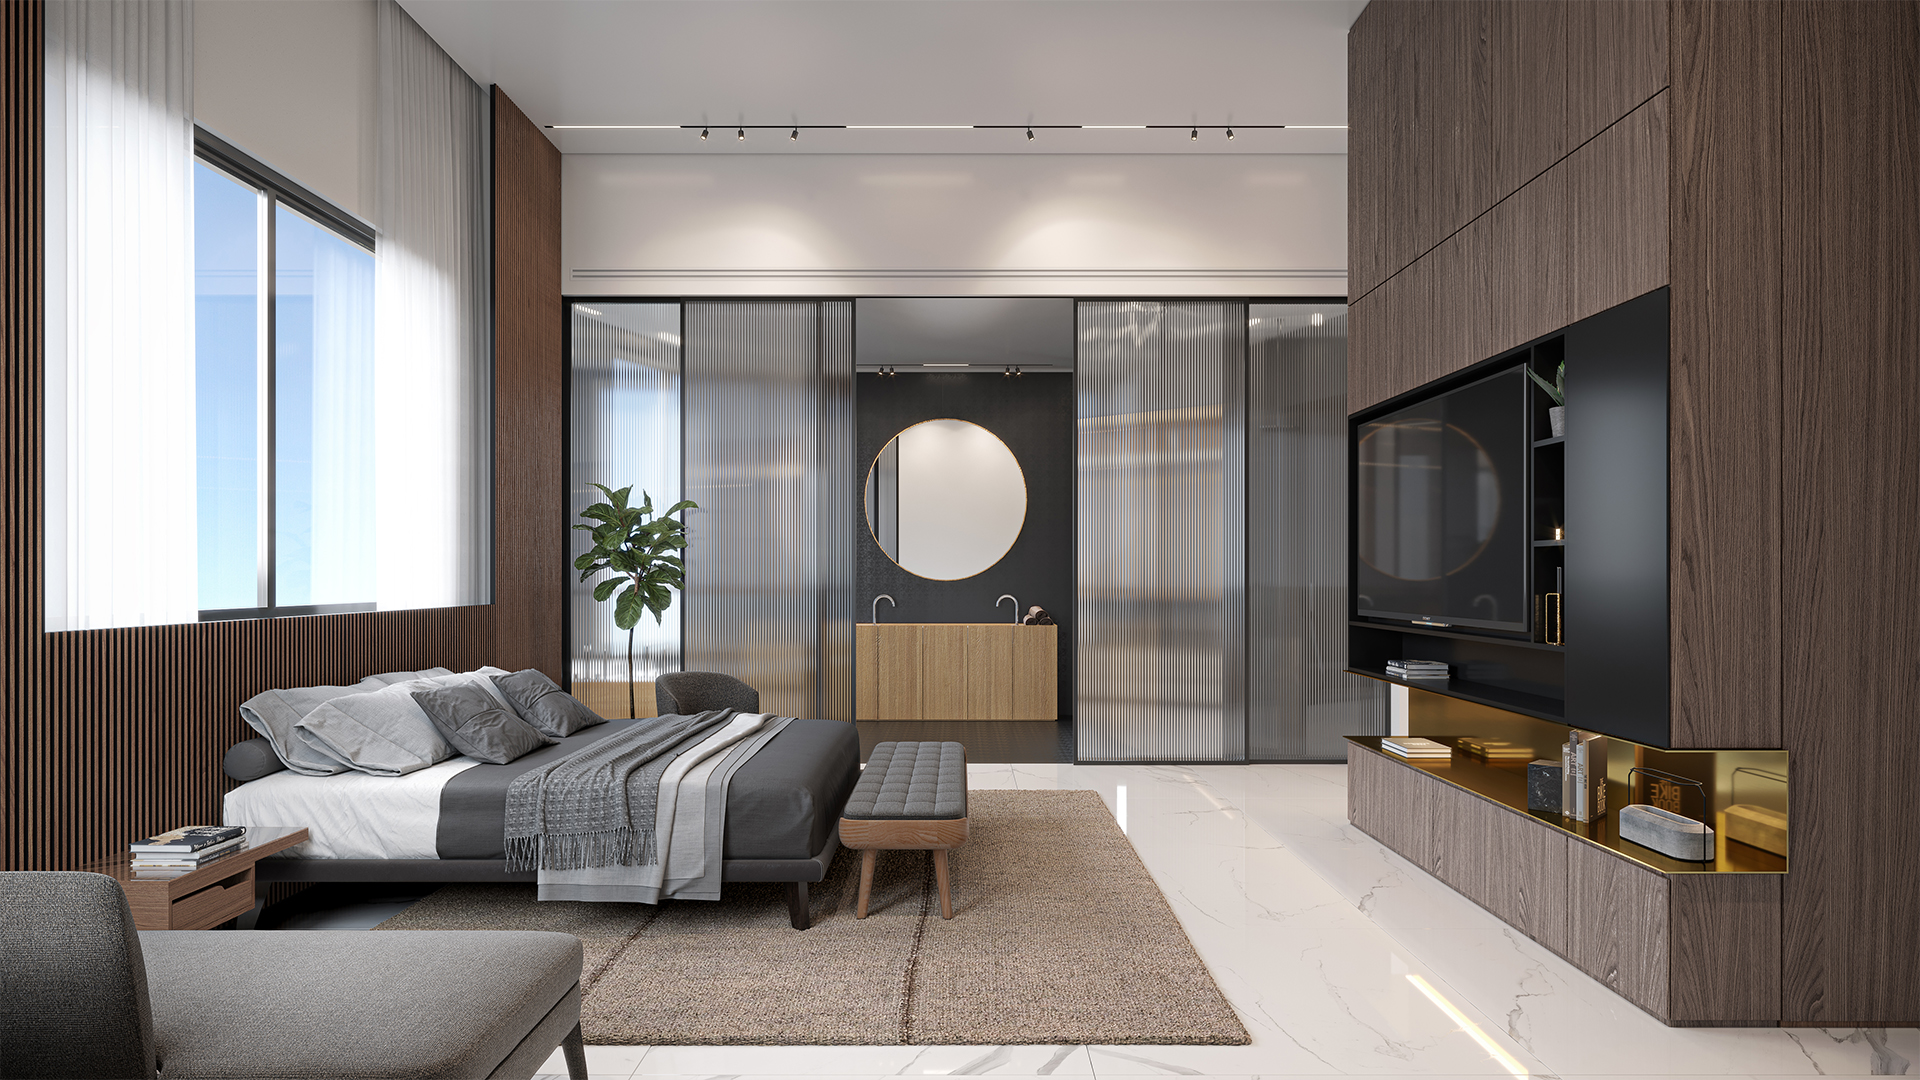 Maayan-Golan_Architectural-Visualization_interior-visualization_penthouse-apartment_master-bedroom_design-by-elad-ben-nahmias_08